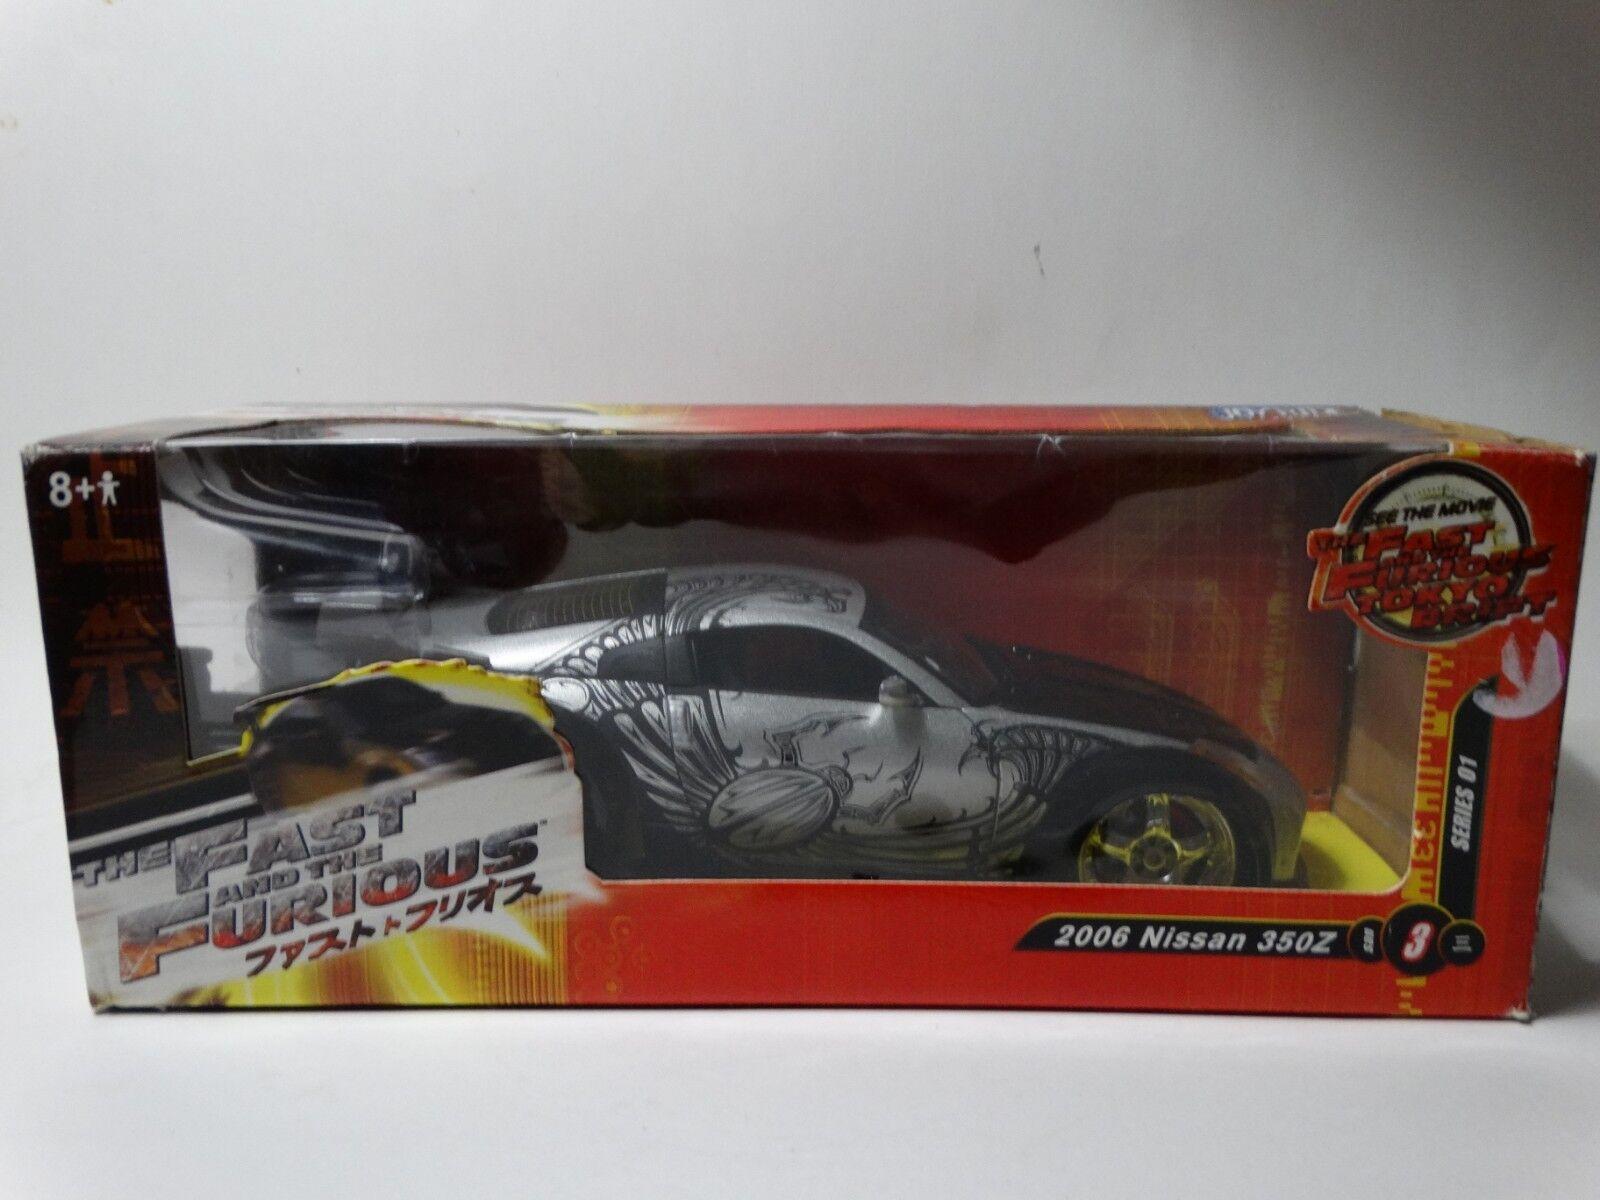 Ertl Joyride Fast And The Furious Tokyo Drift 2006 Nissan 350Z 1 24 Diecast Car